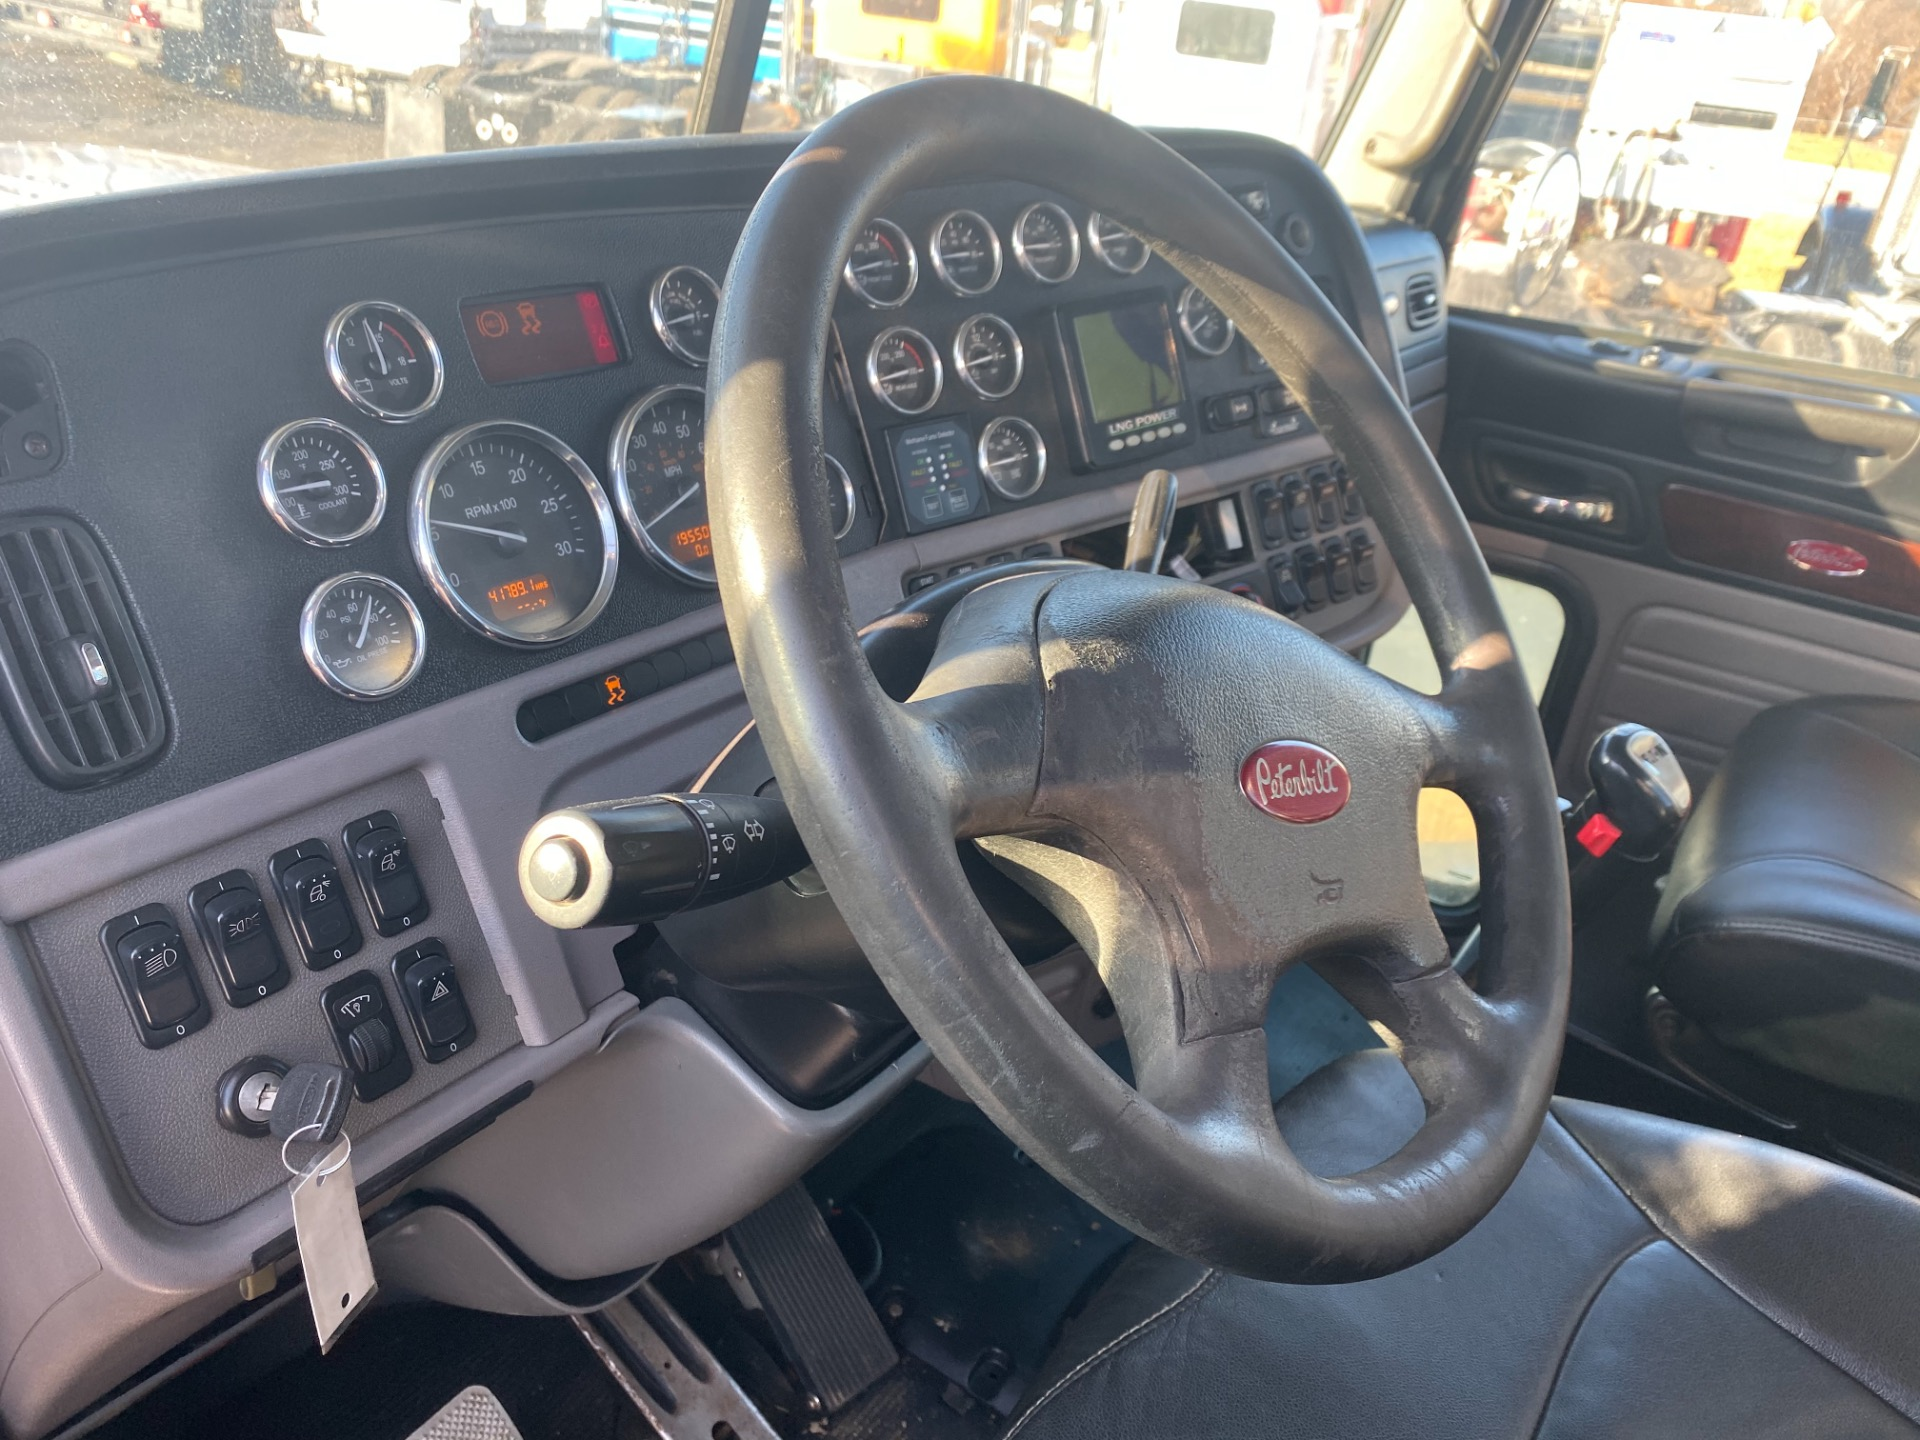 Used-2012-Peterbilt-388-Day-Cab